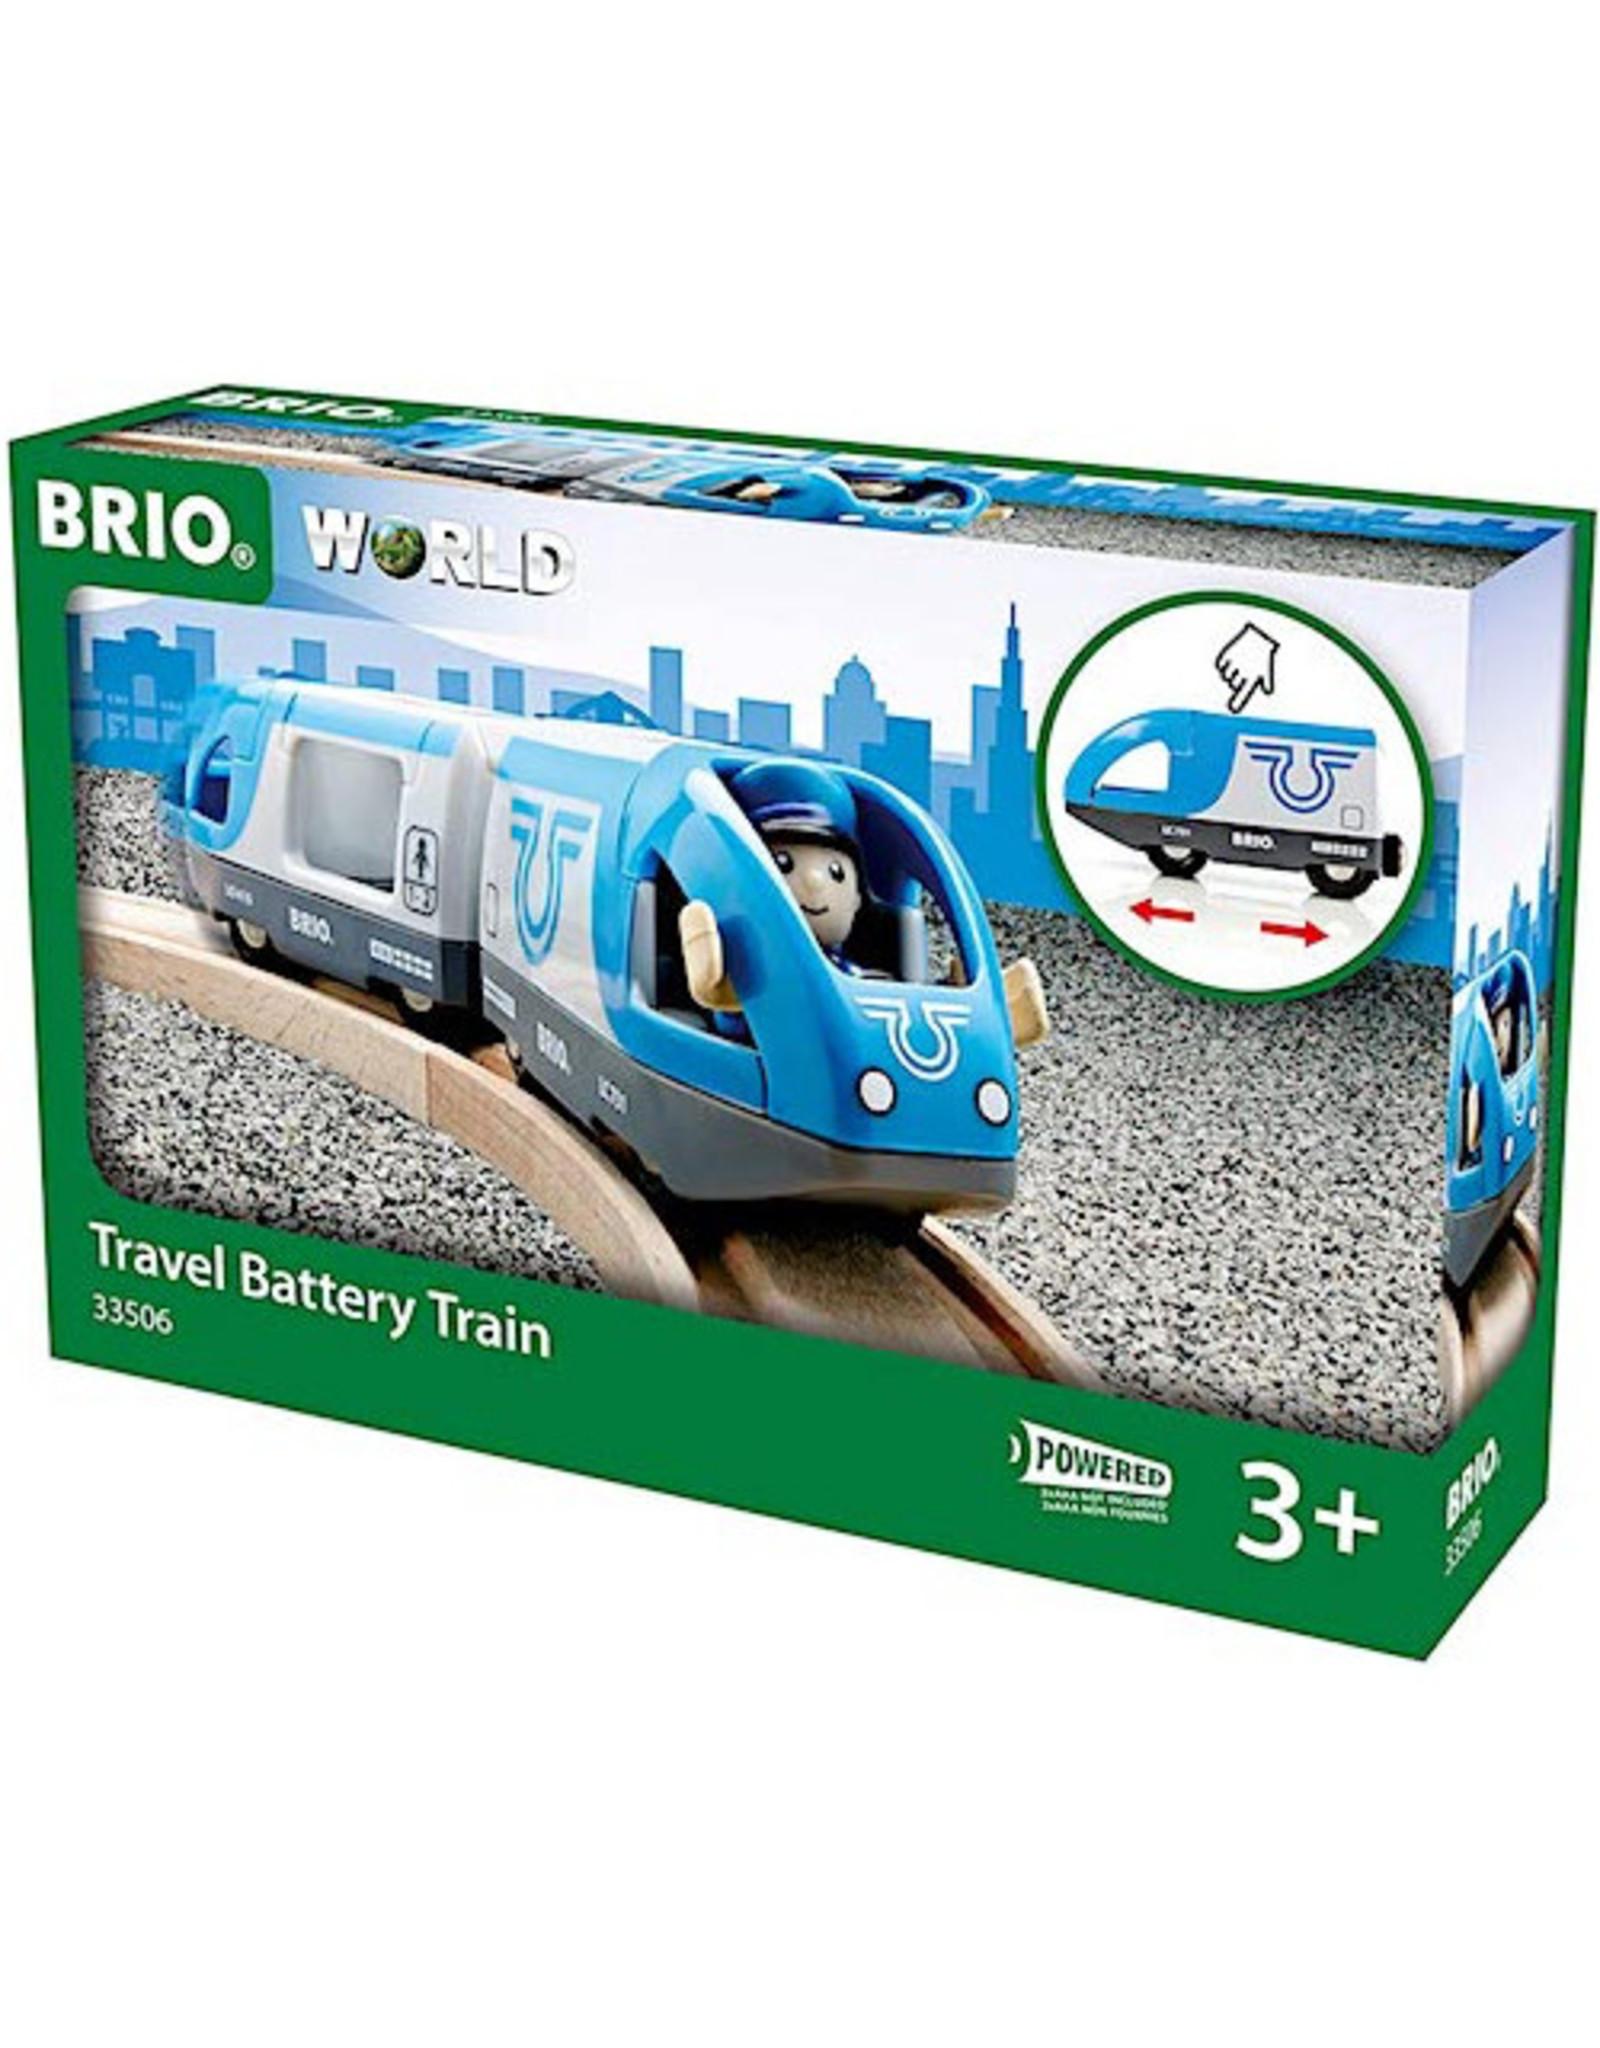 Ravensburger Travel Battery Train